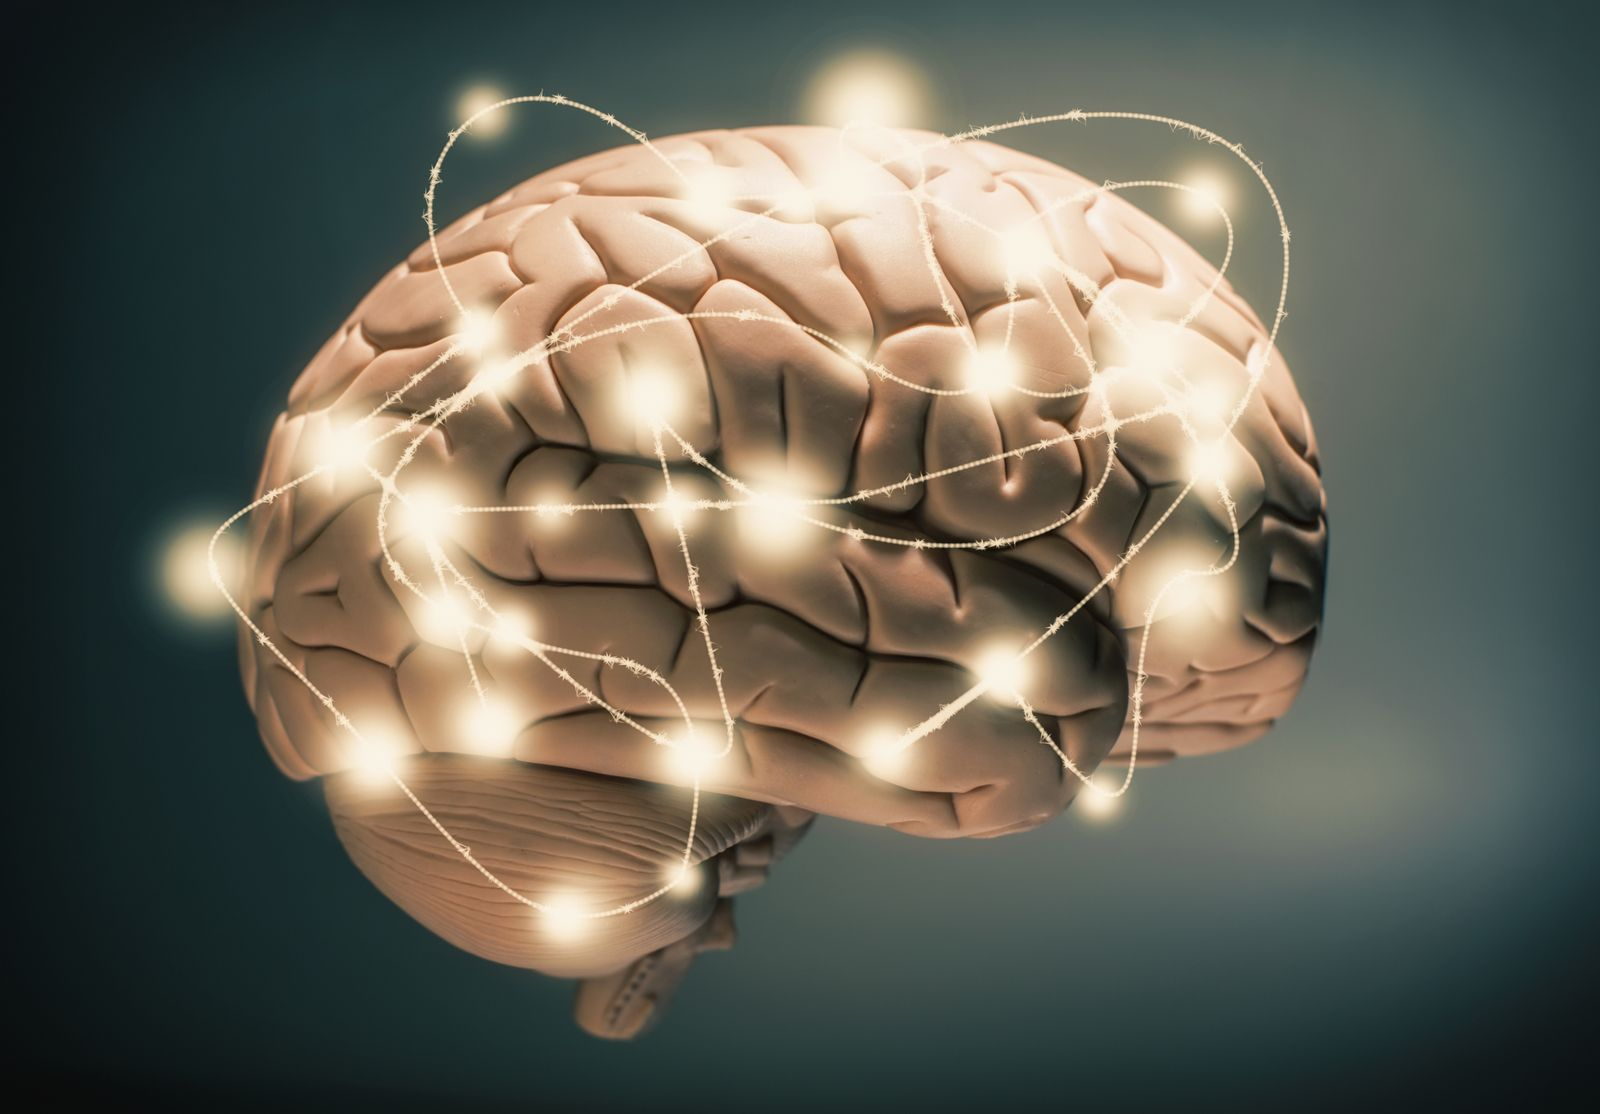 Gehirn / Funken / Aktiv / Idee